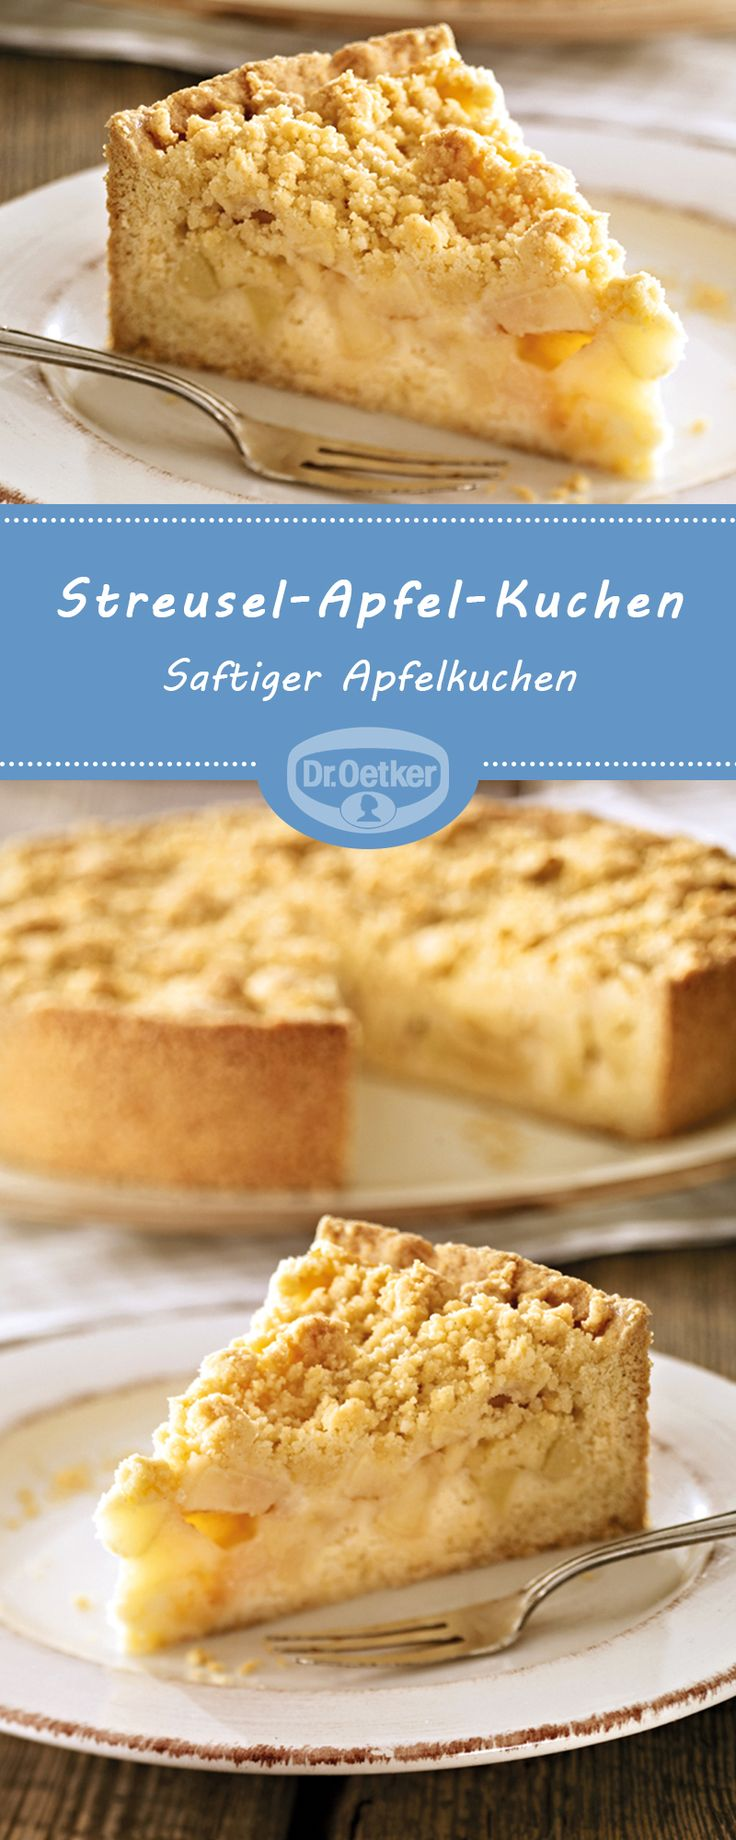 Streusel-Apfel-Kuchen